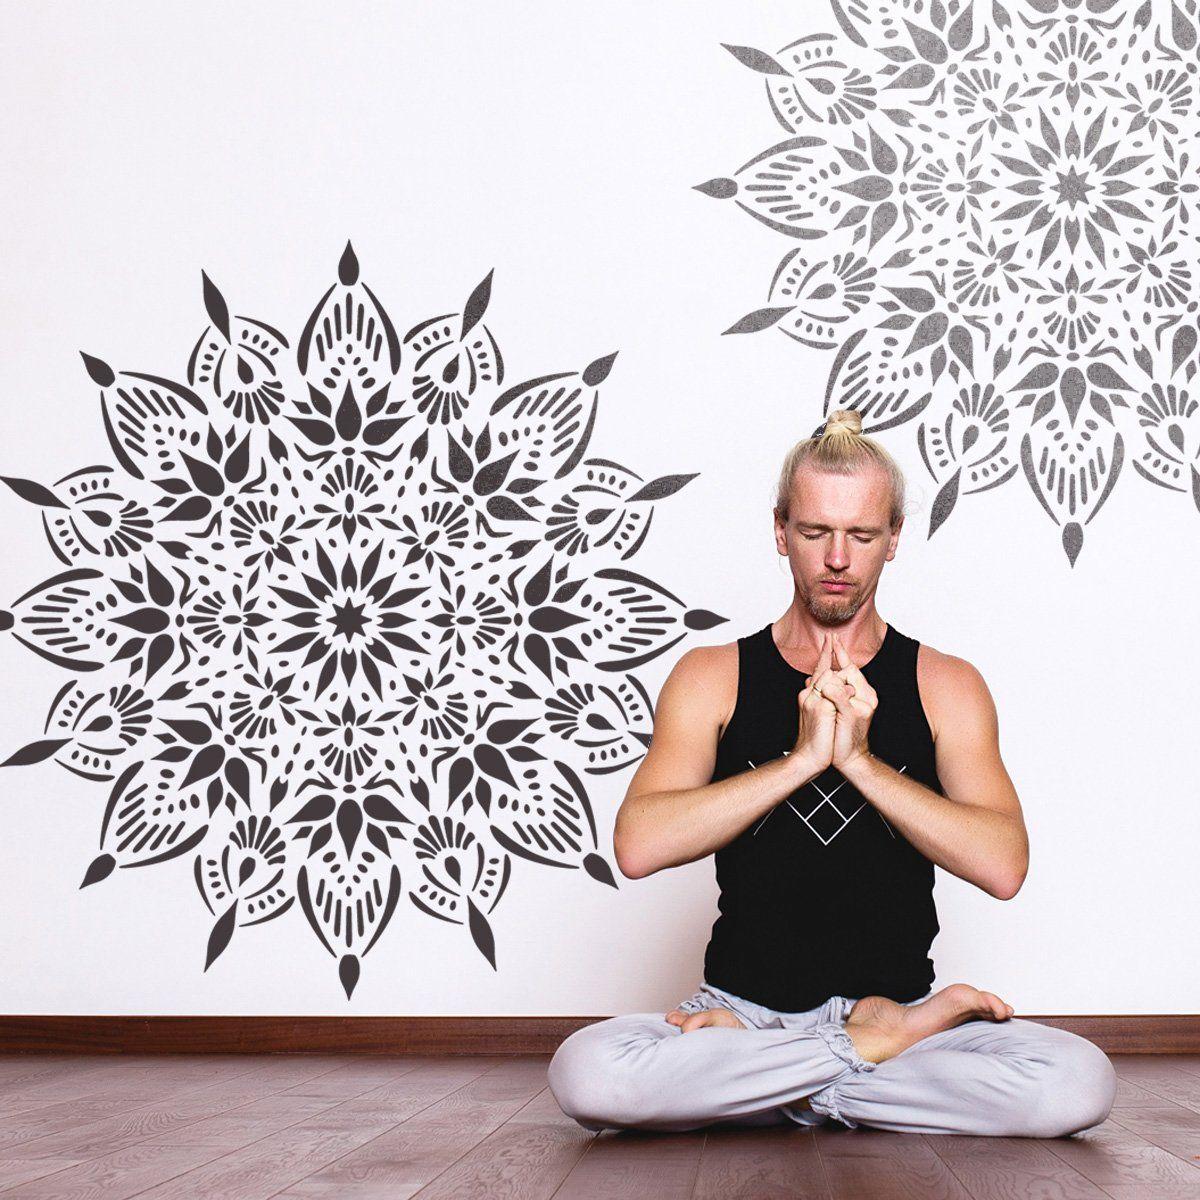 Reflections Mandala Stencil by CraftStar Large Reusable DIY Mandala Template